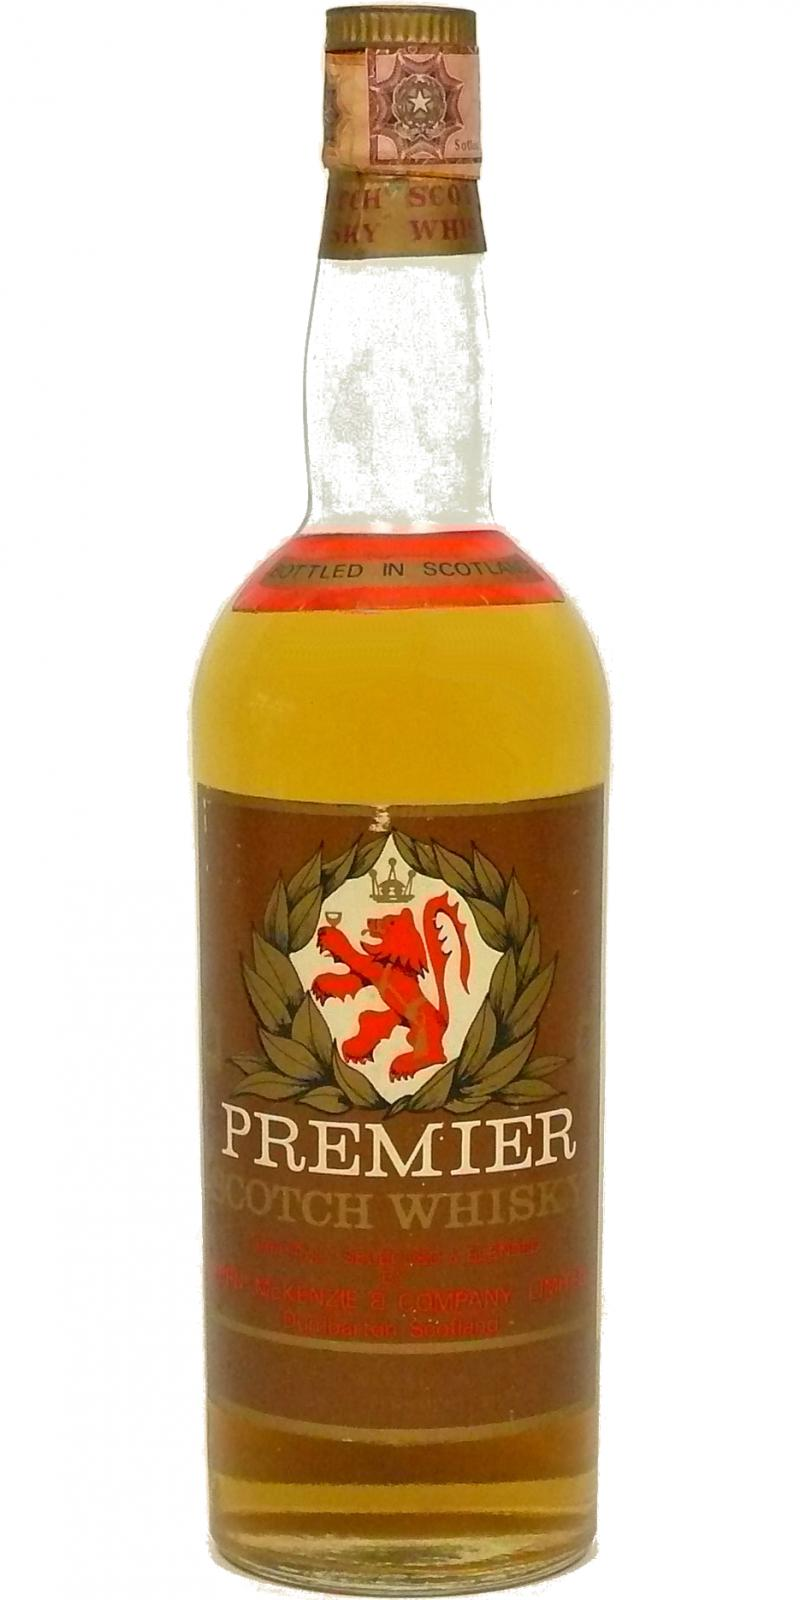 Premier Scotch Whisky